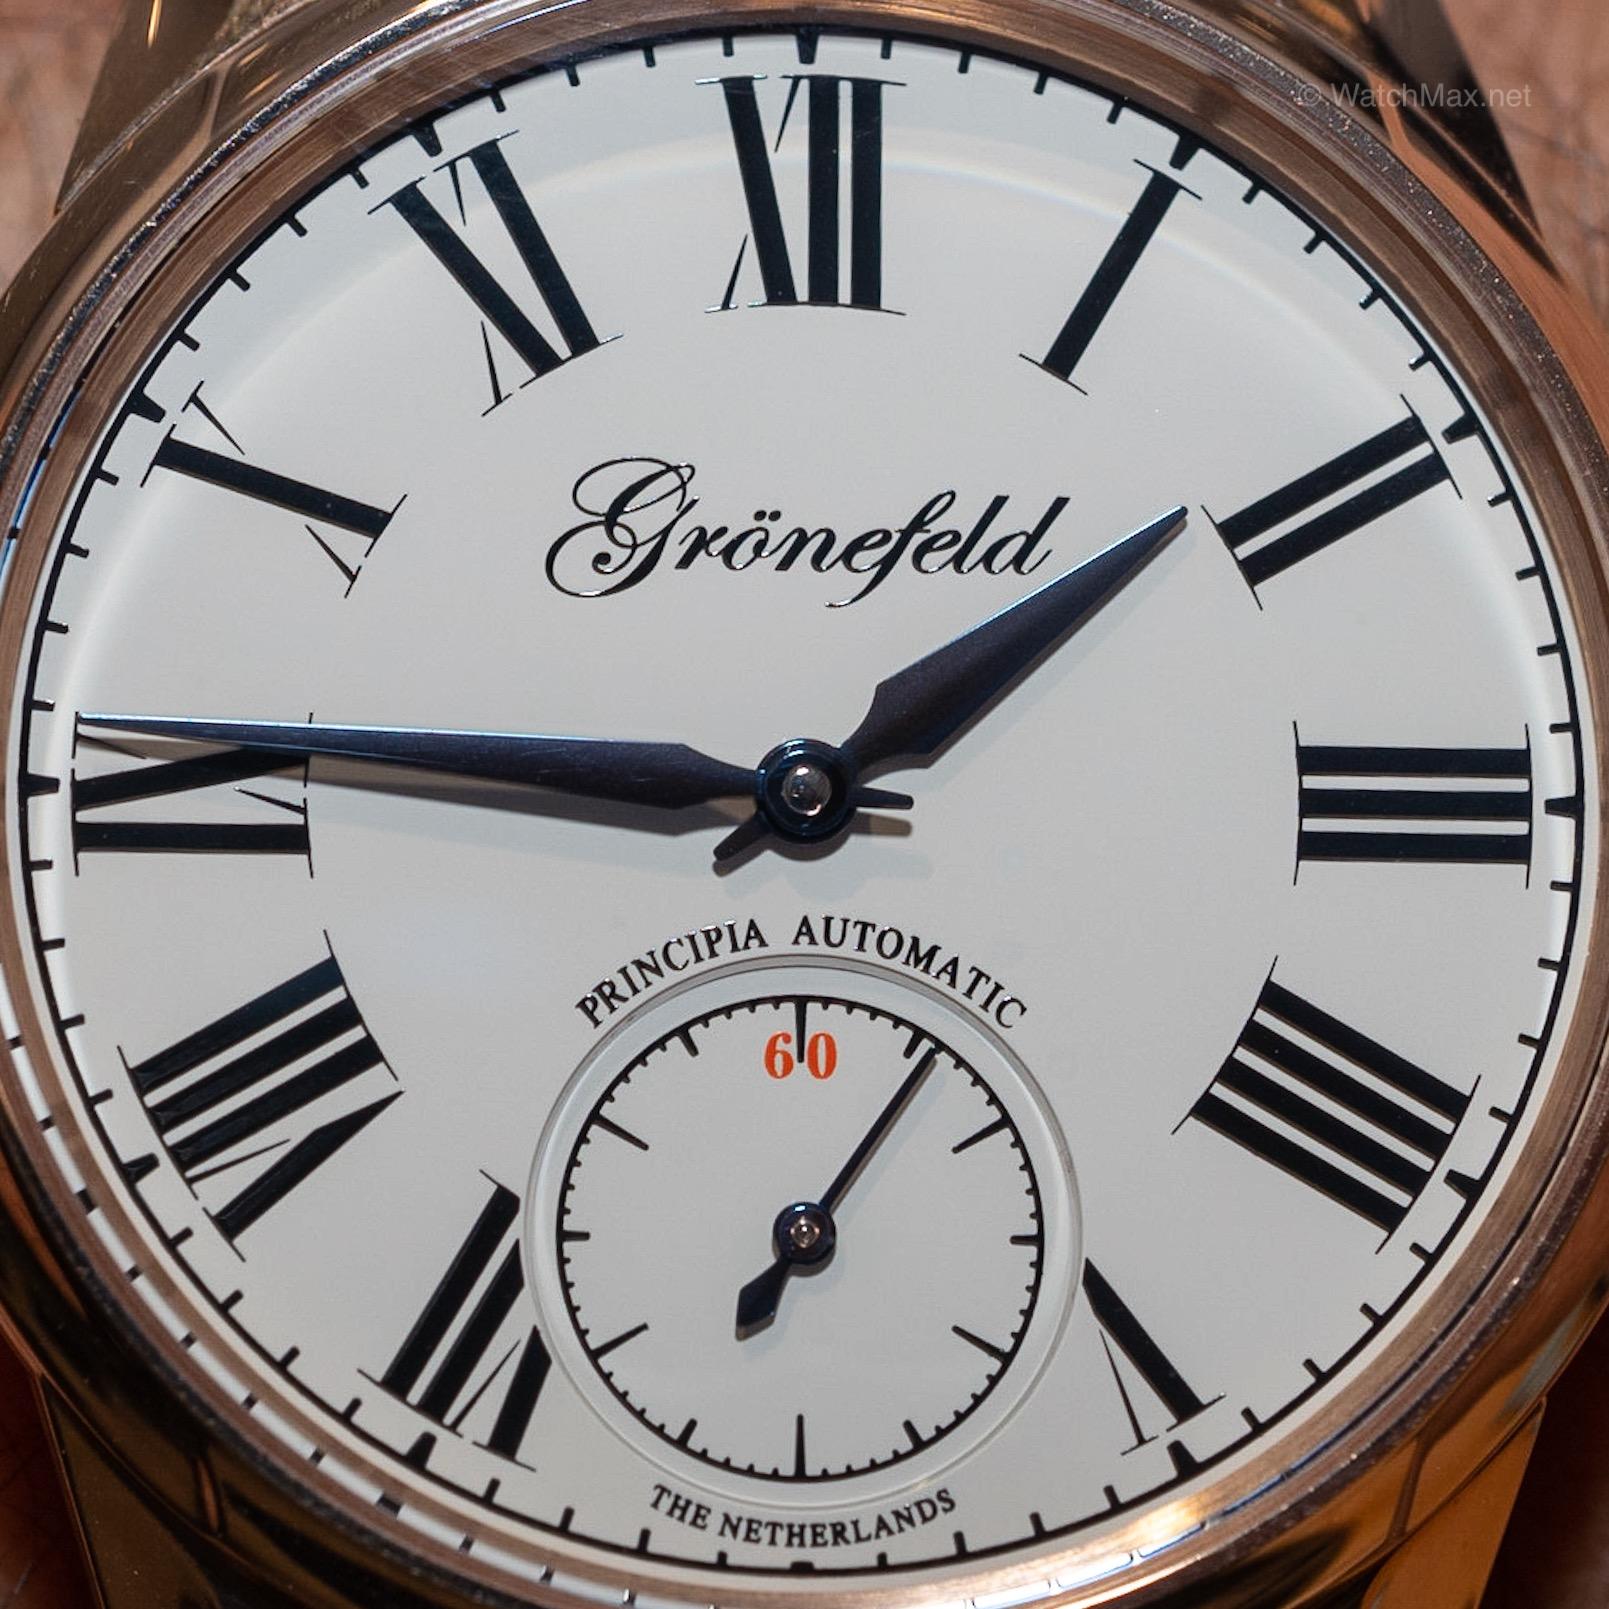 gronefeld-principia-watch-sihh-2019-15.jpg